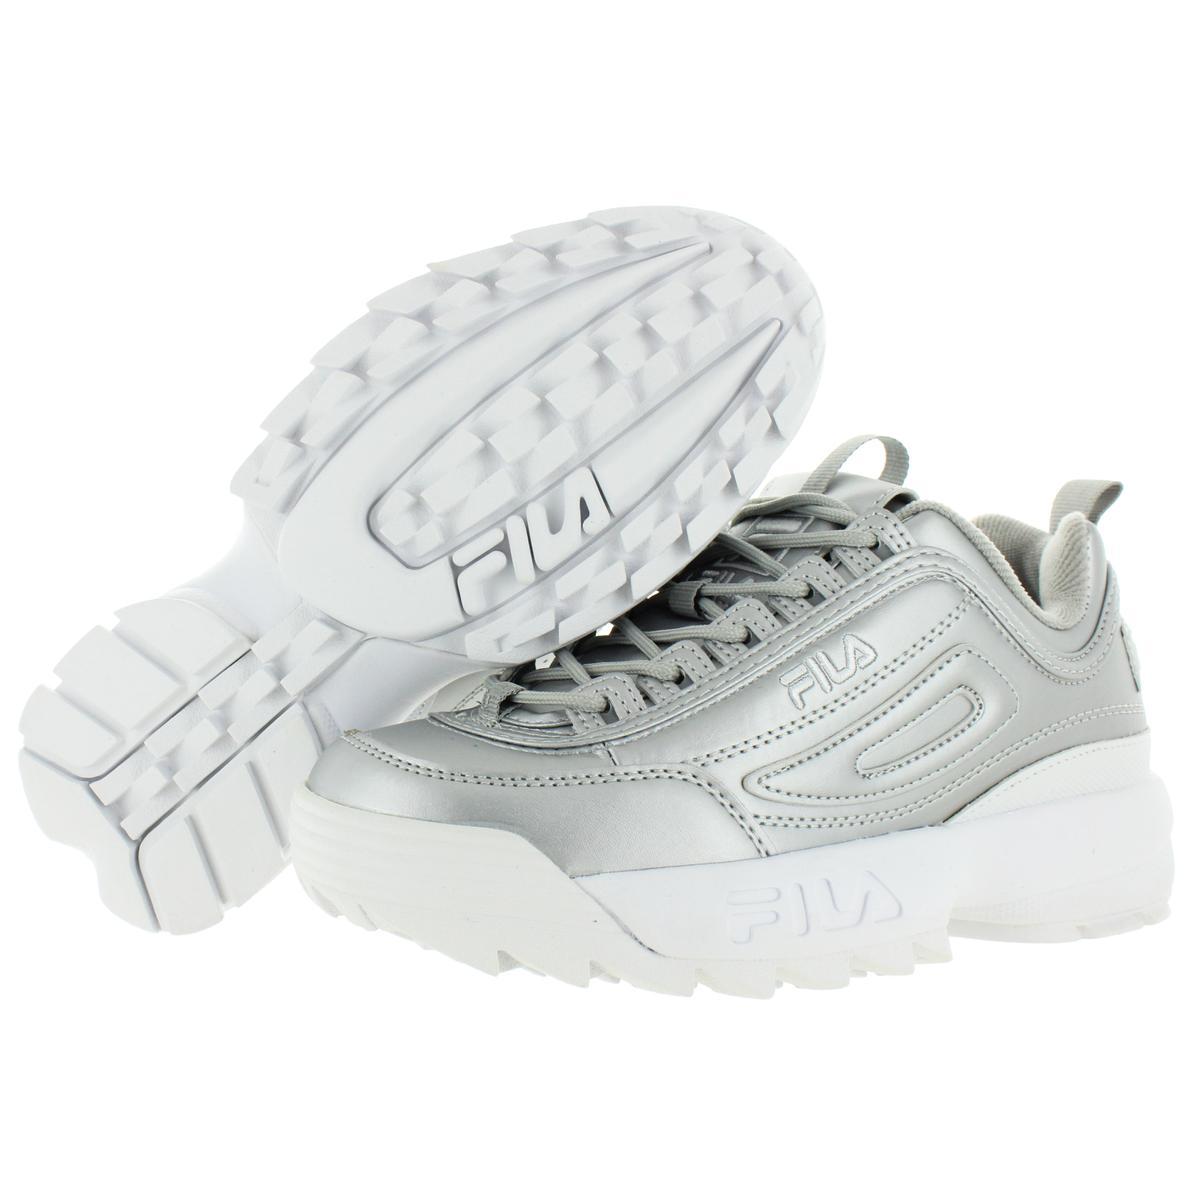 Fila-Womens-Disruptor-II-Premium-Metallic-Trainers-Sneakers-Shoes-BHFO-5237 thumbnail 7